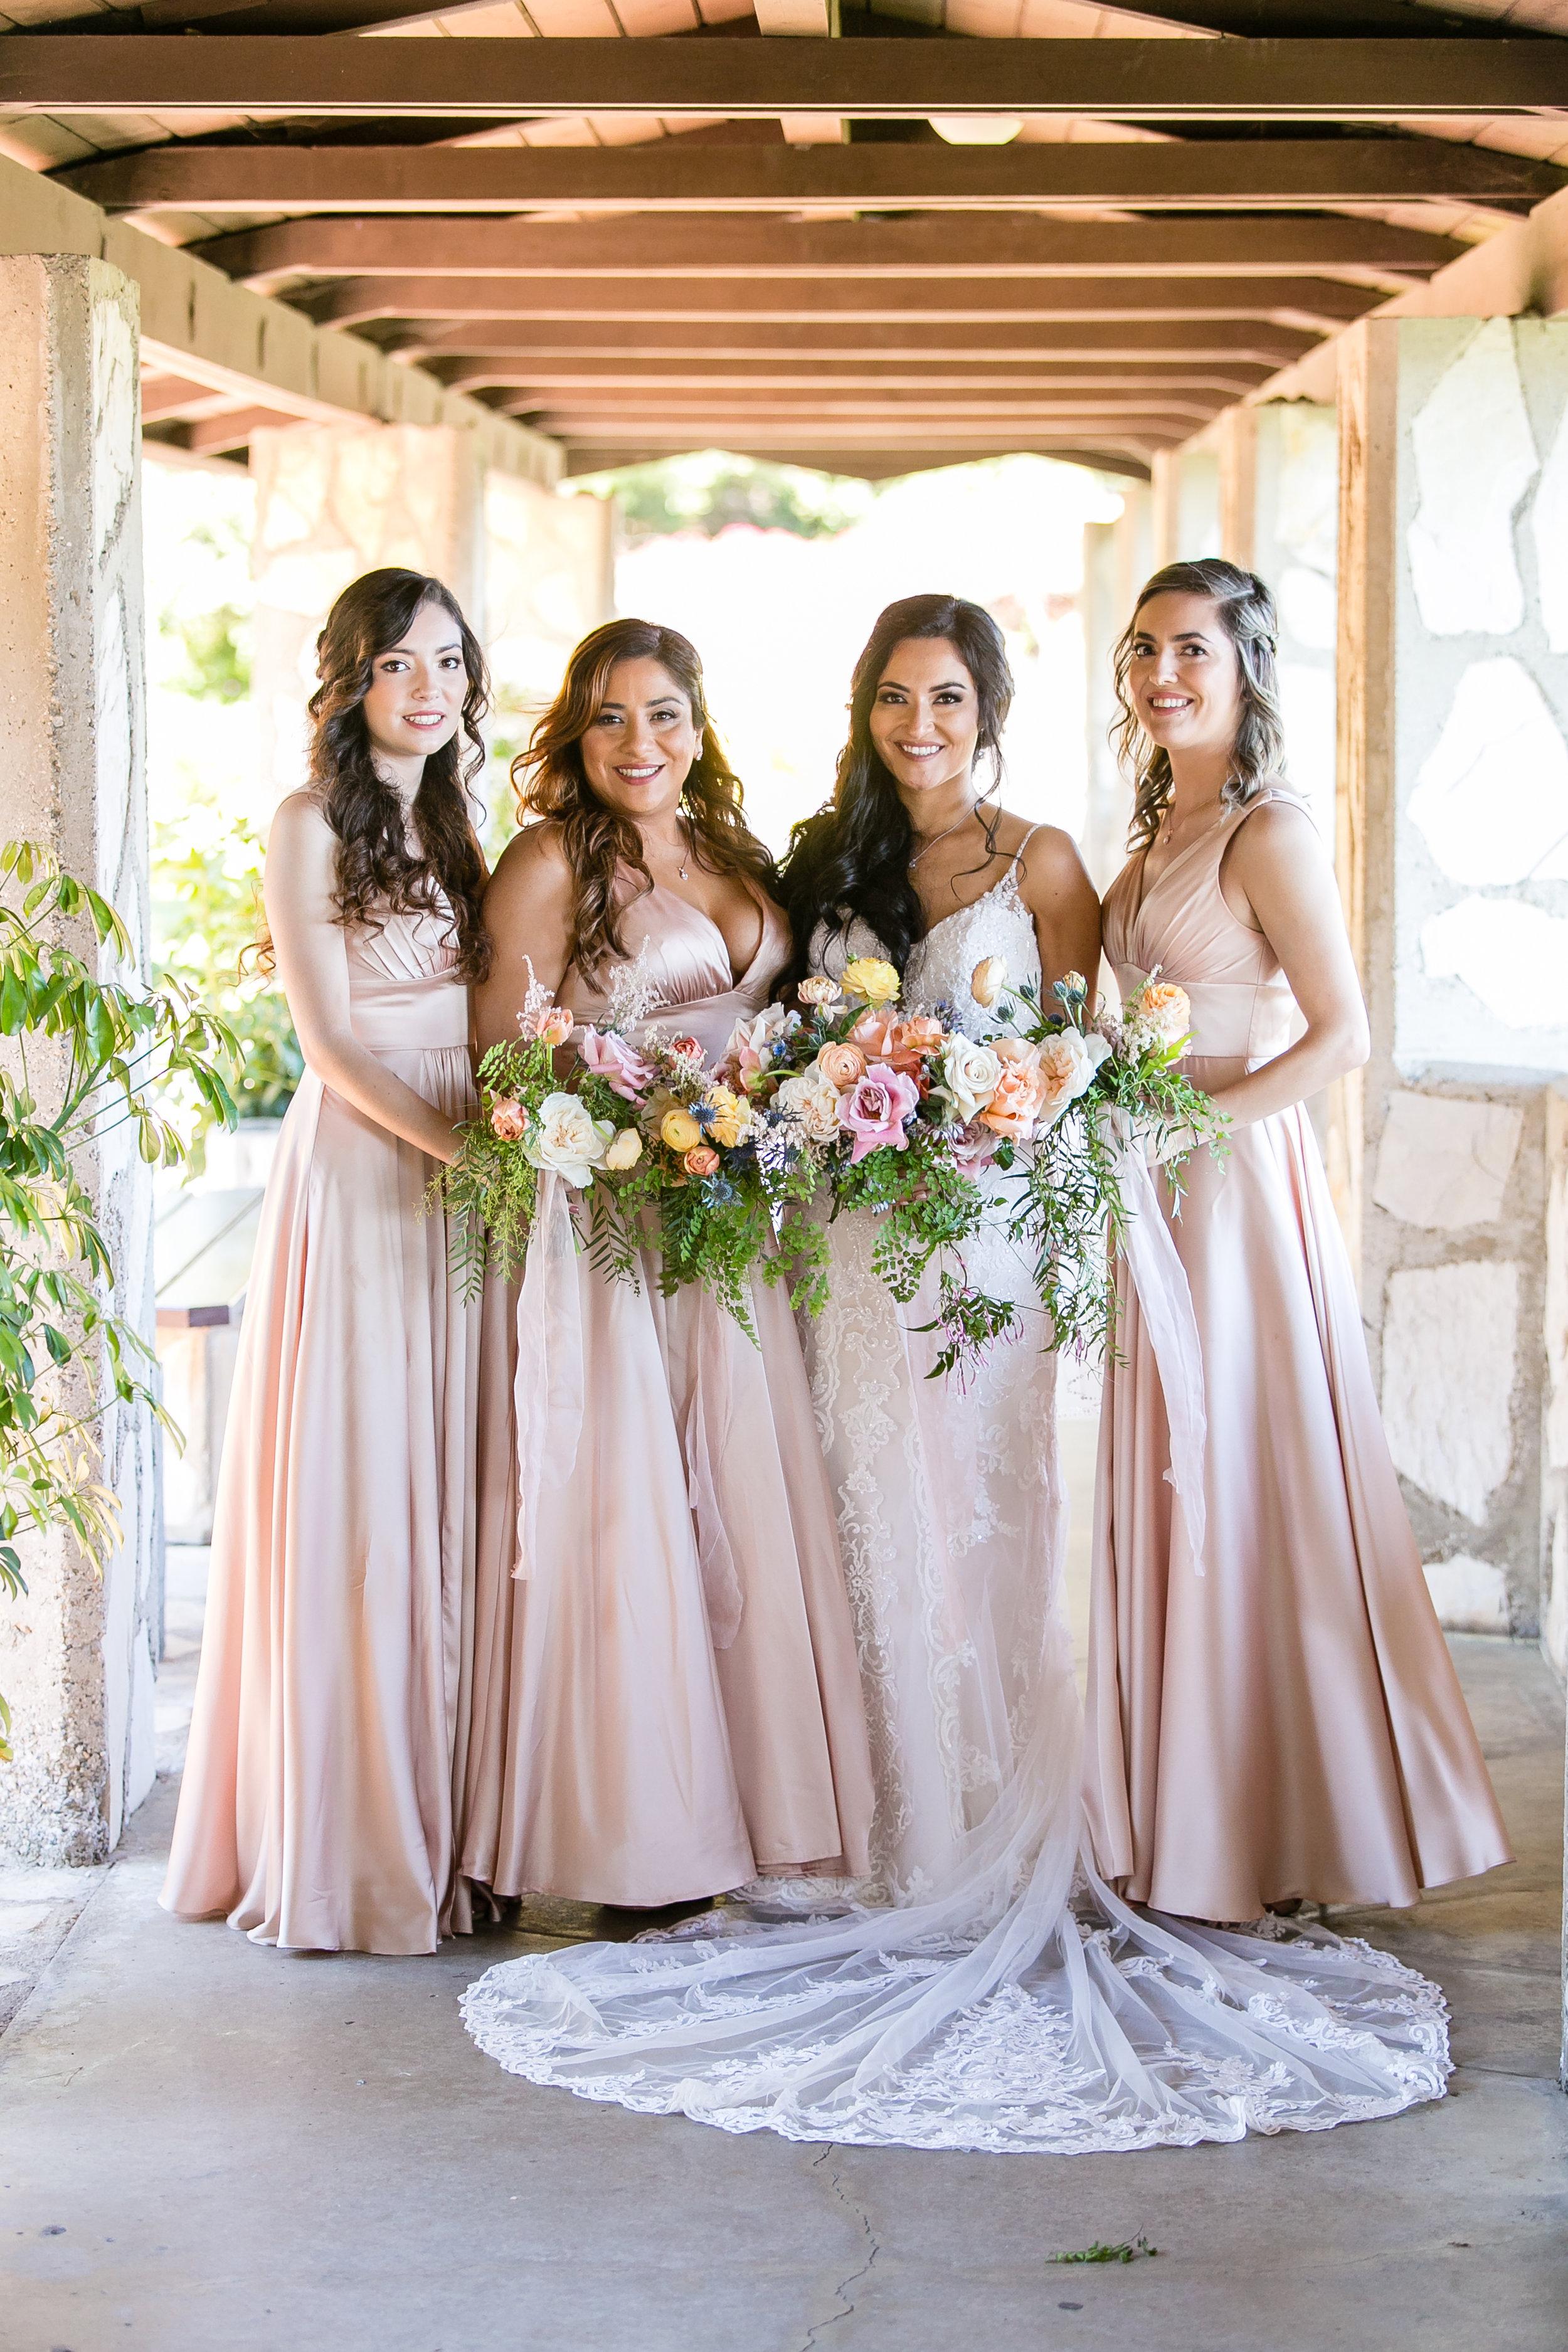 2019_05_24_Wedding_Barajas_0460.jpg